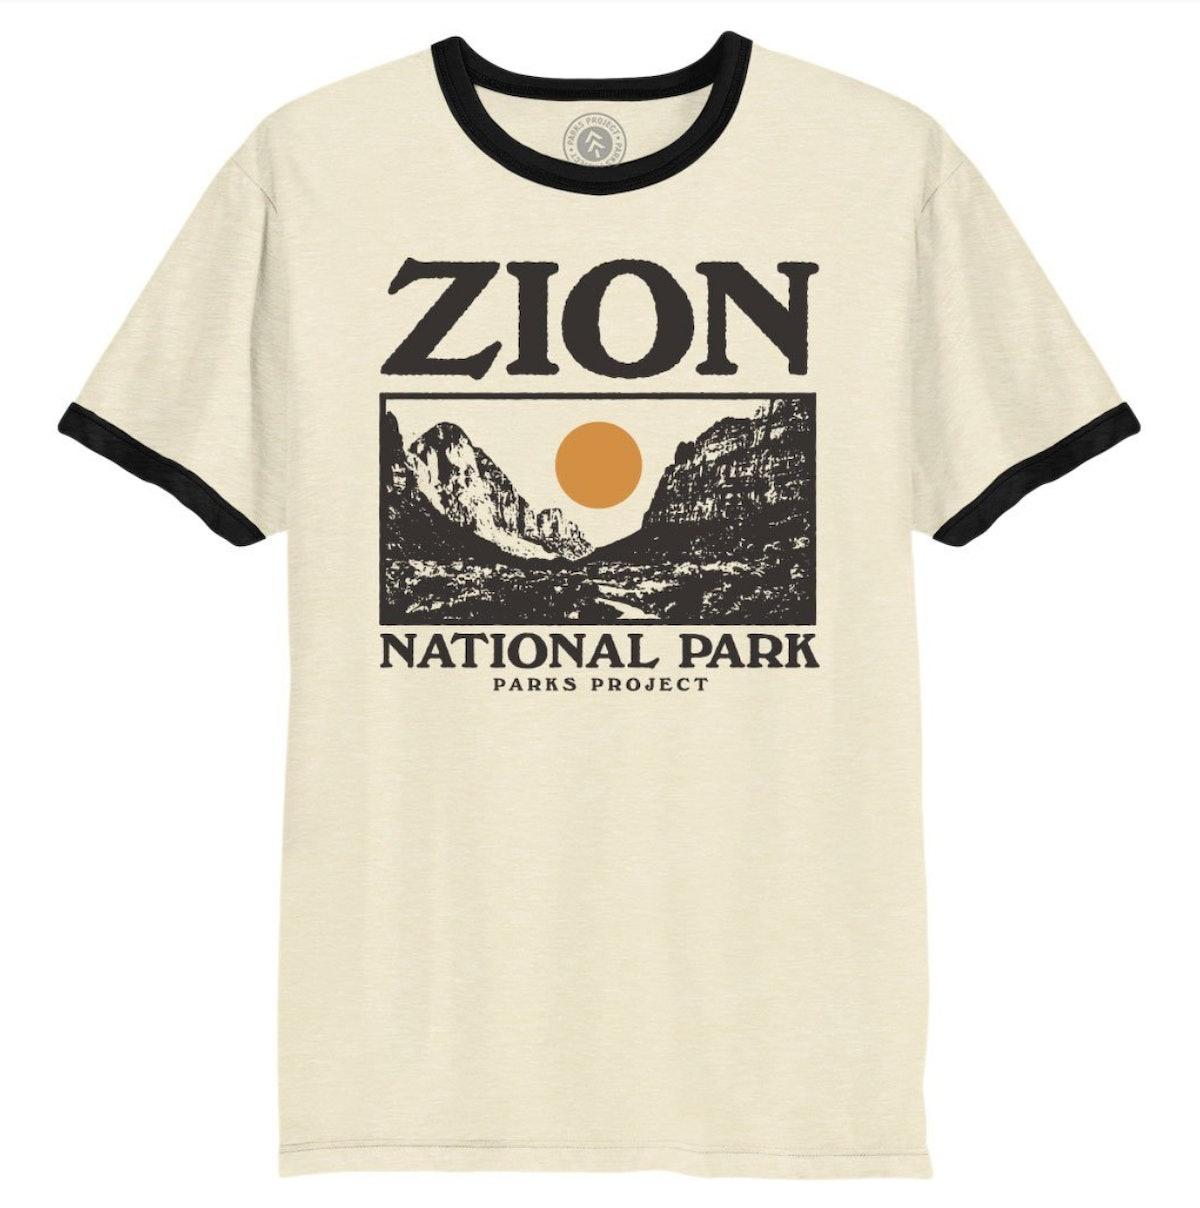 Zion Photo Ringer Tee